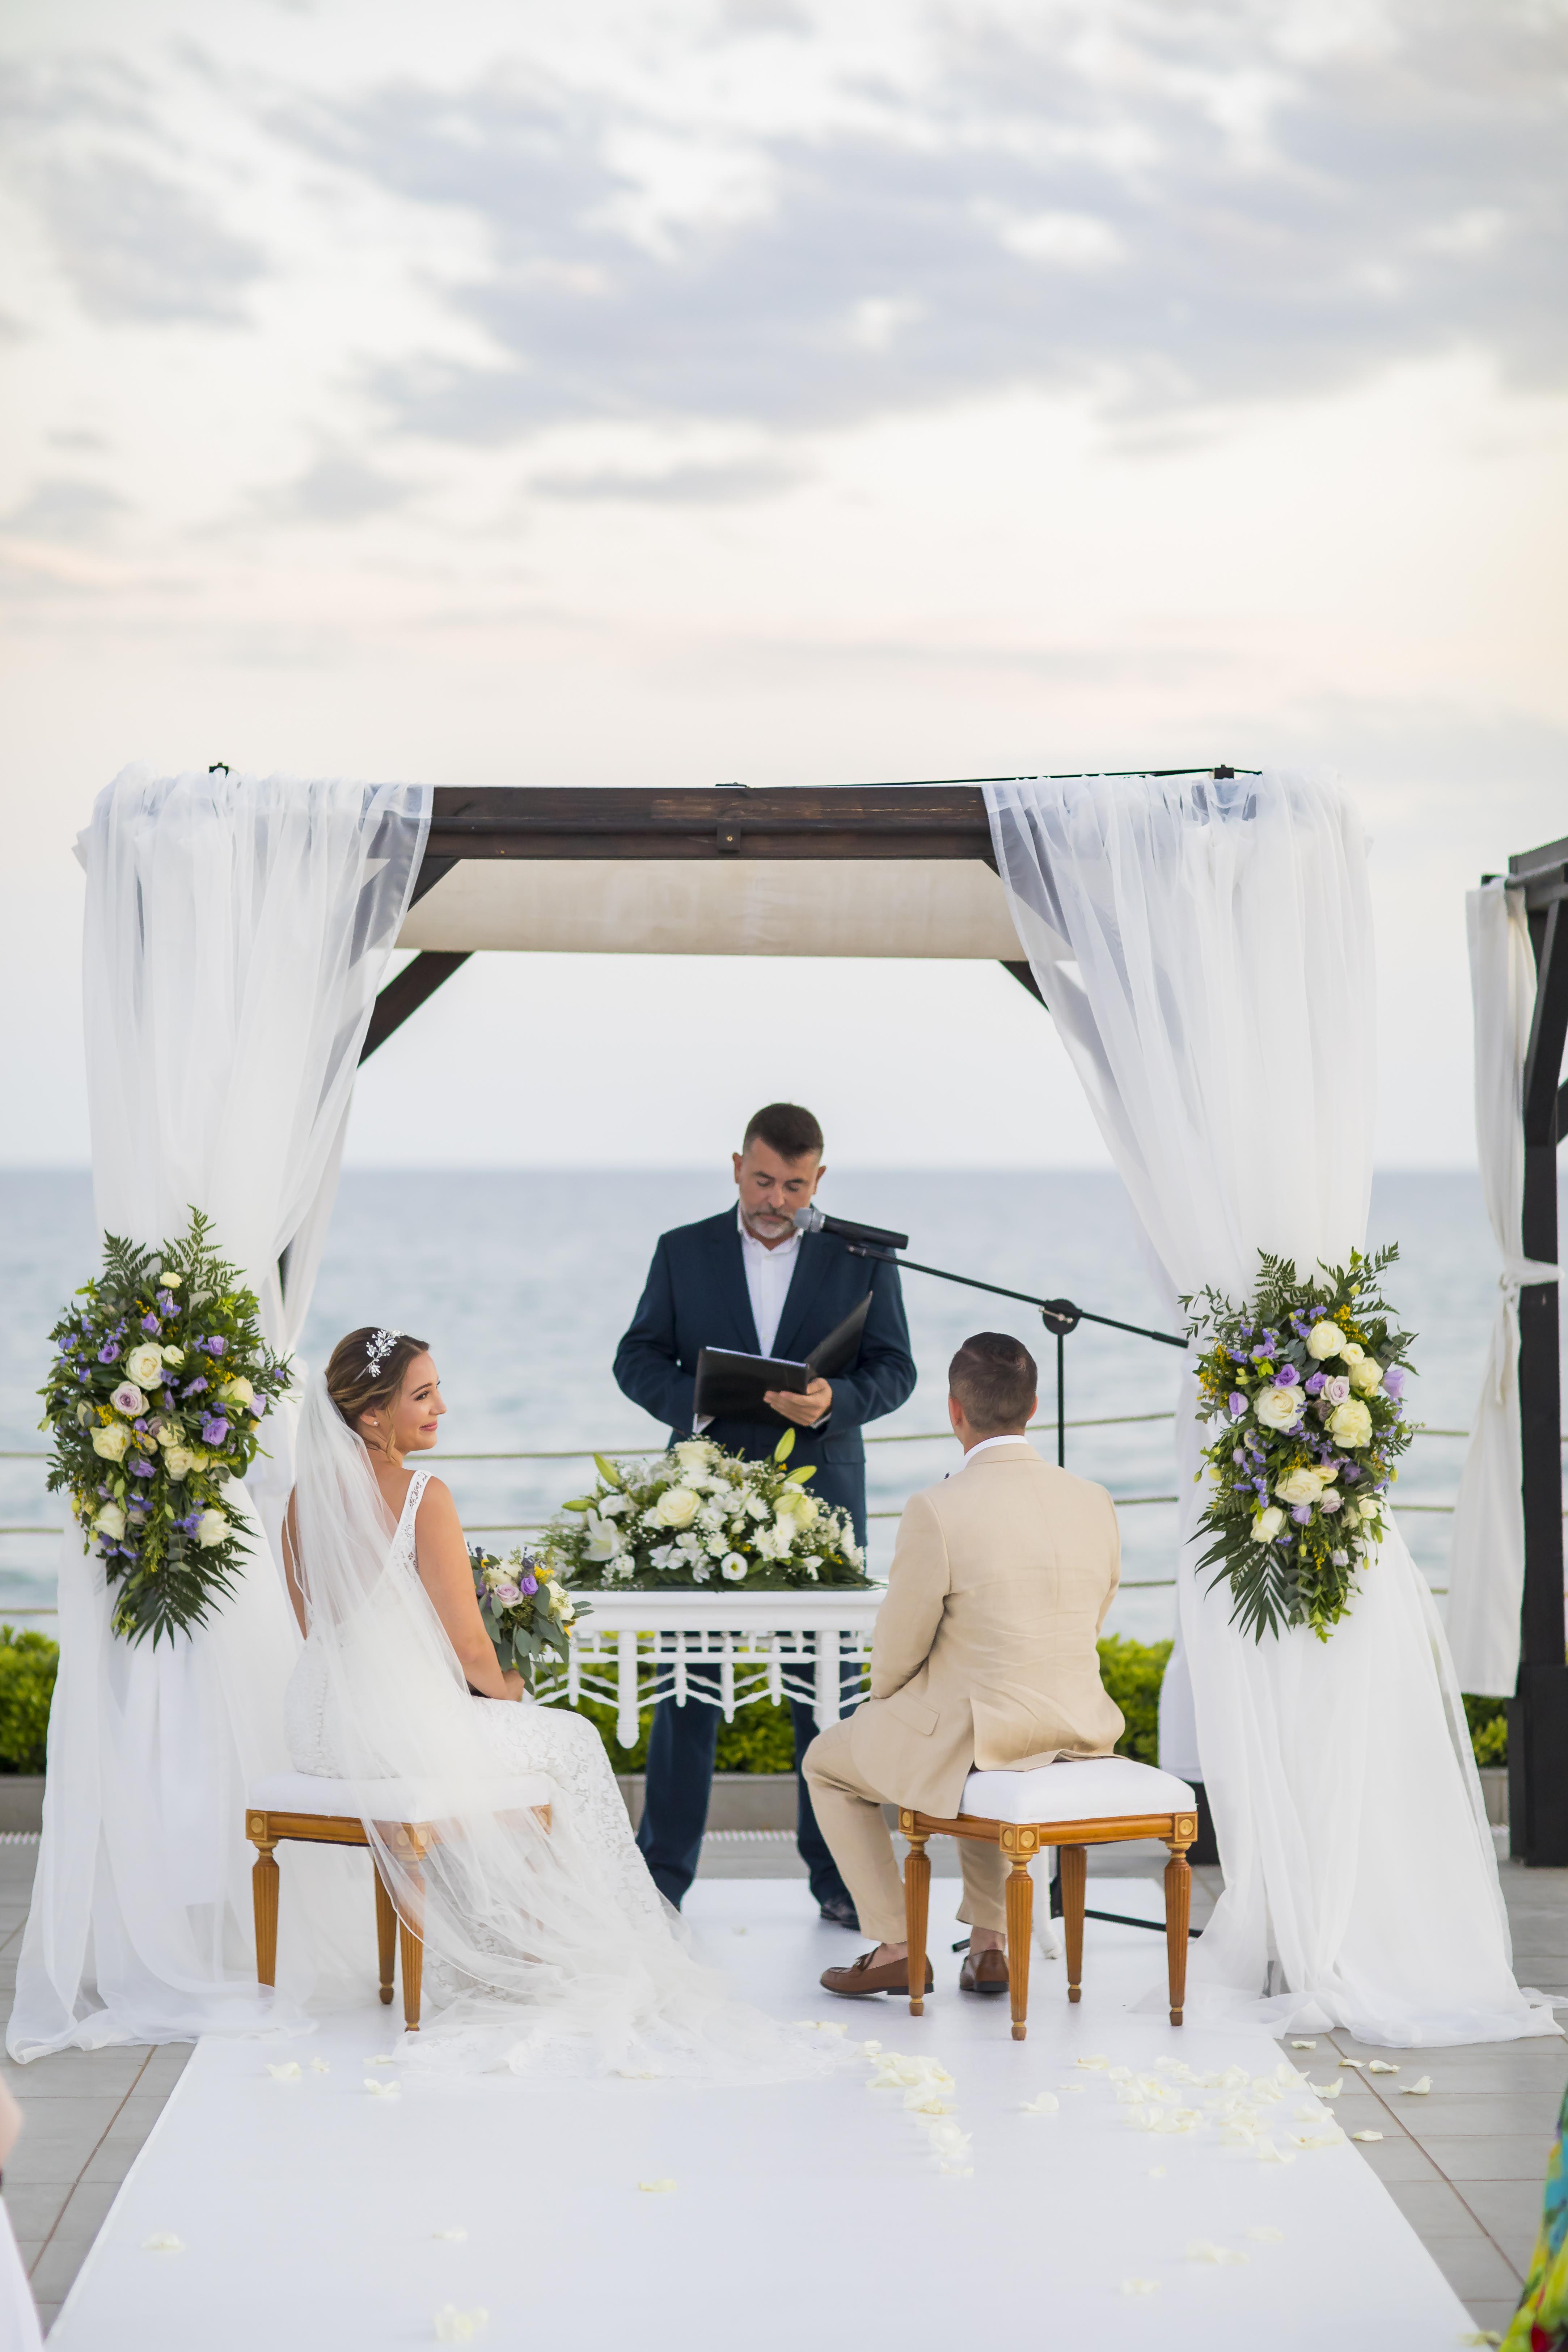 The beautiful ceremony overlooking the Mediterranean Sea